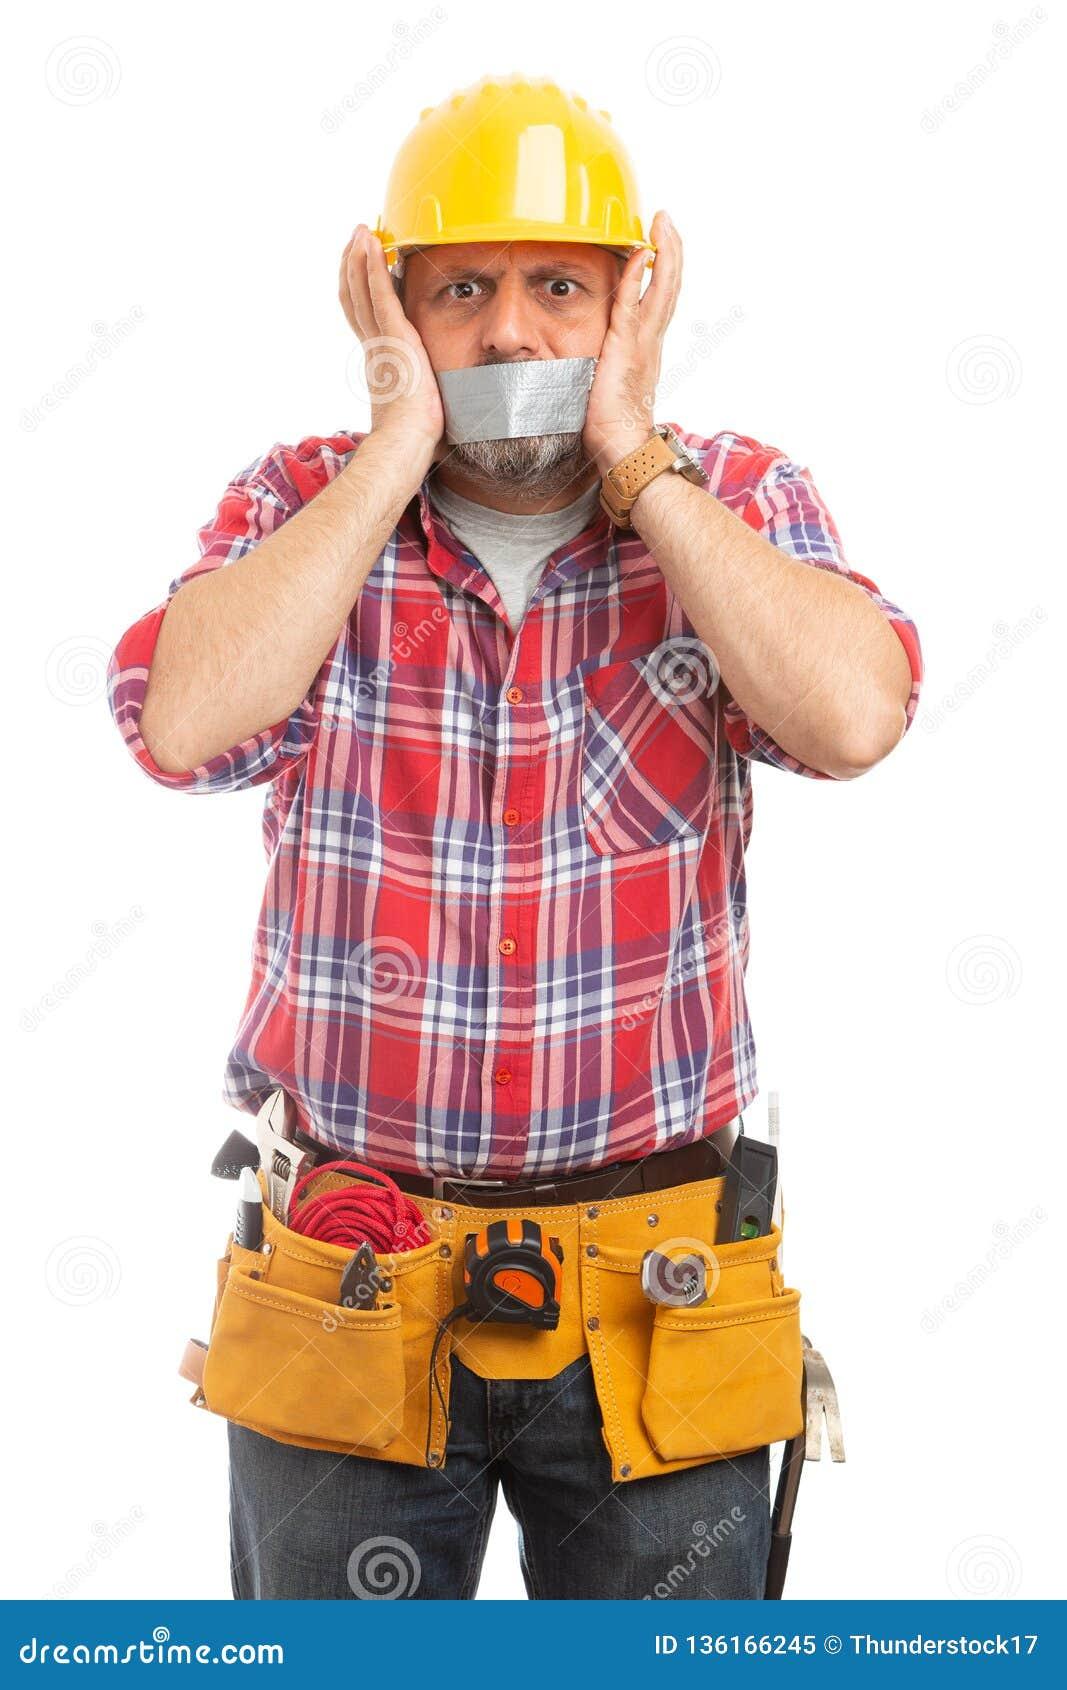 Aannemer met buisband op mond